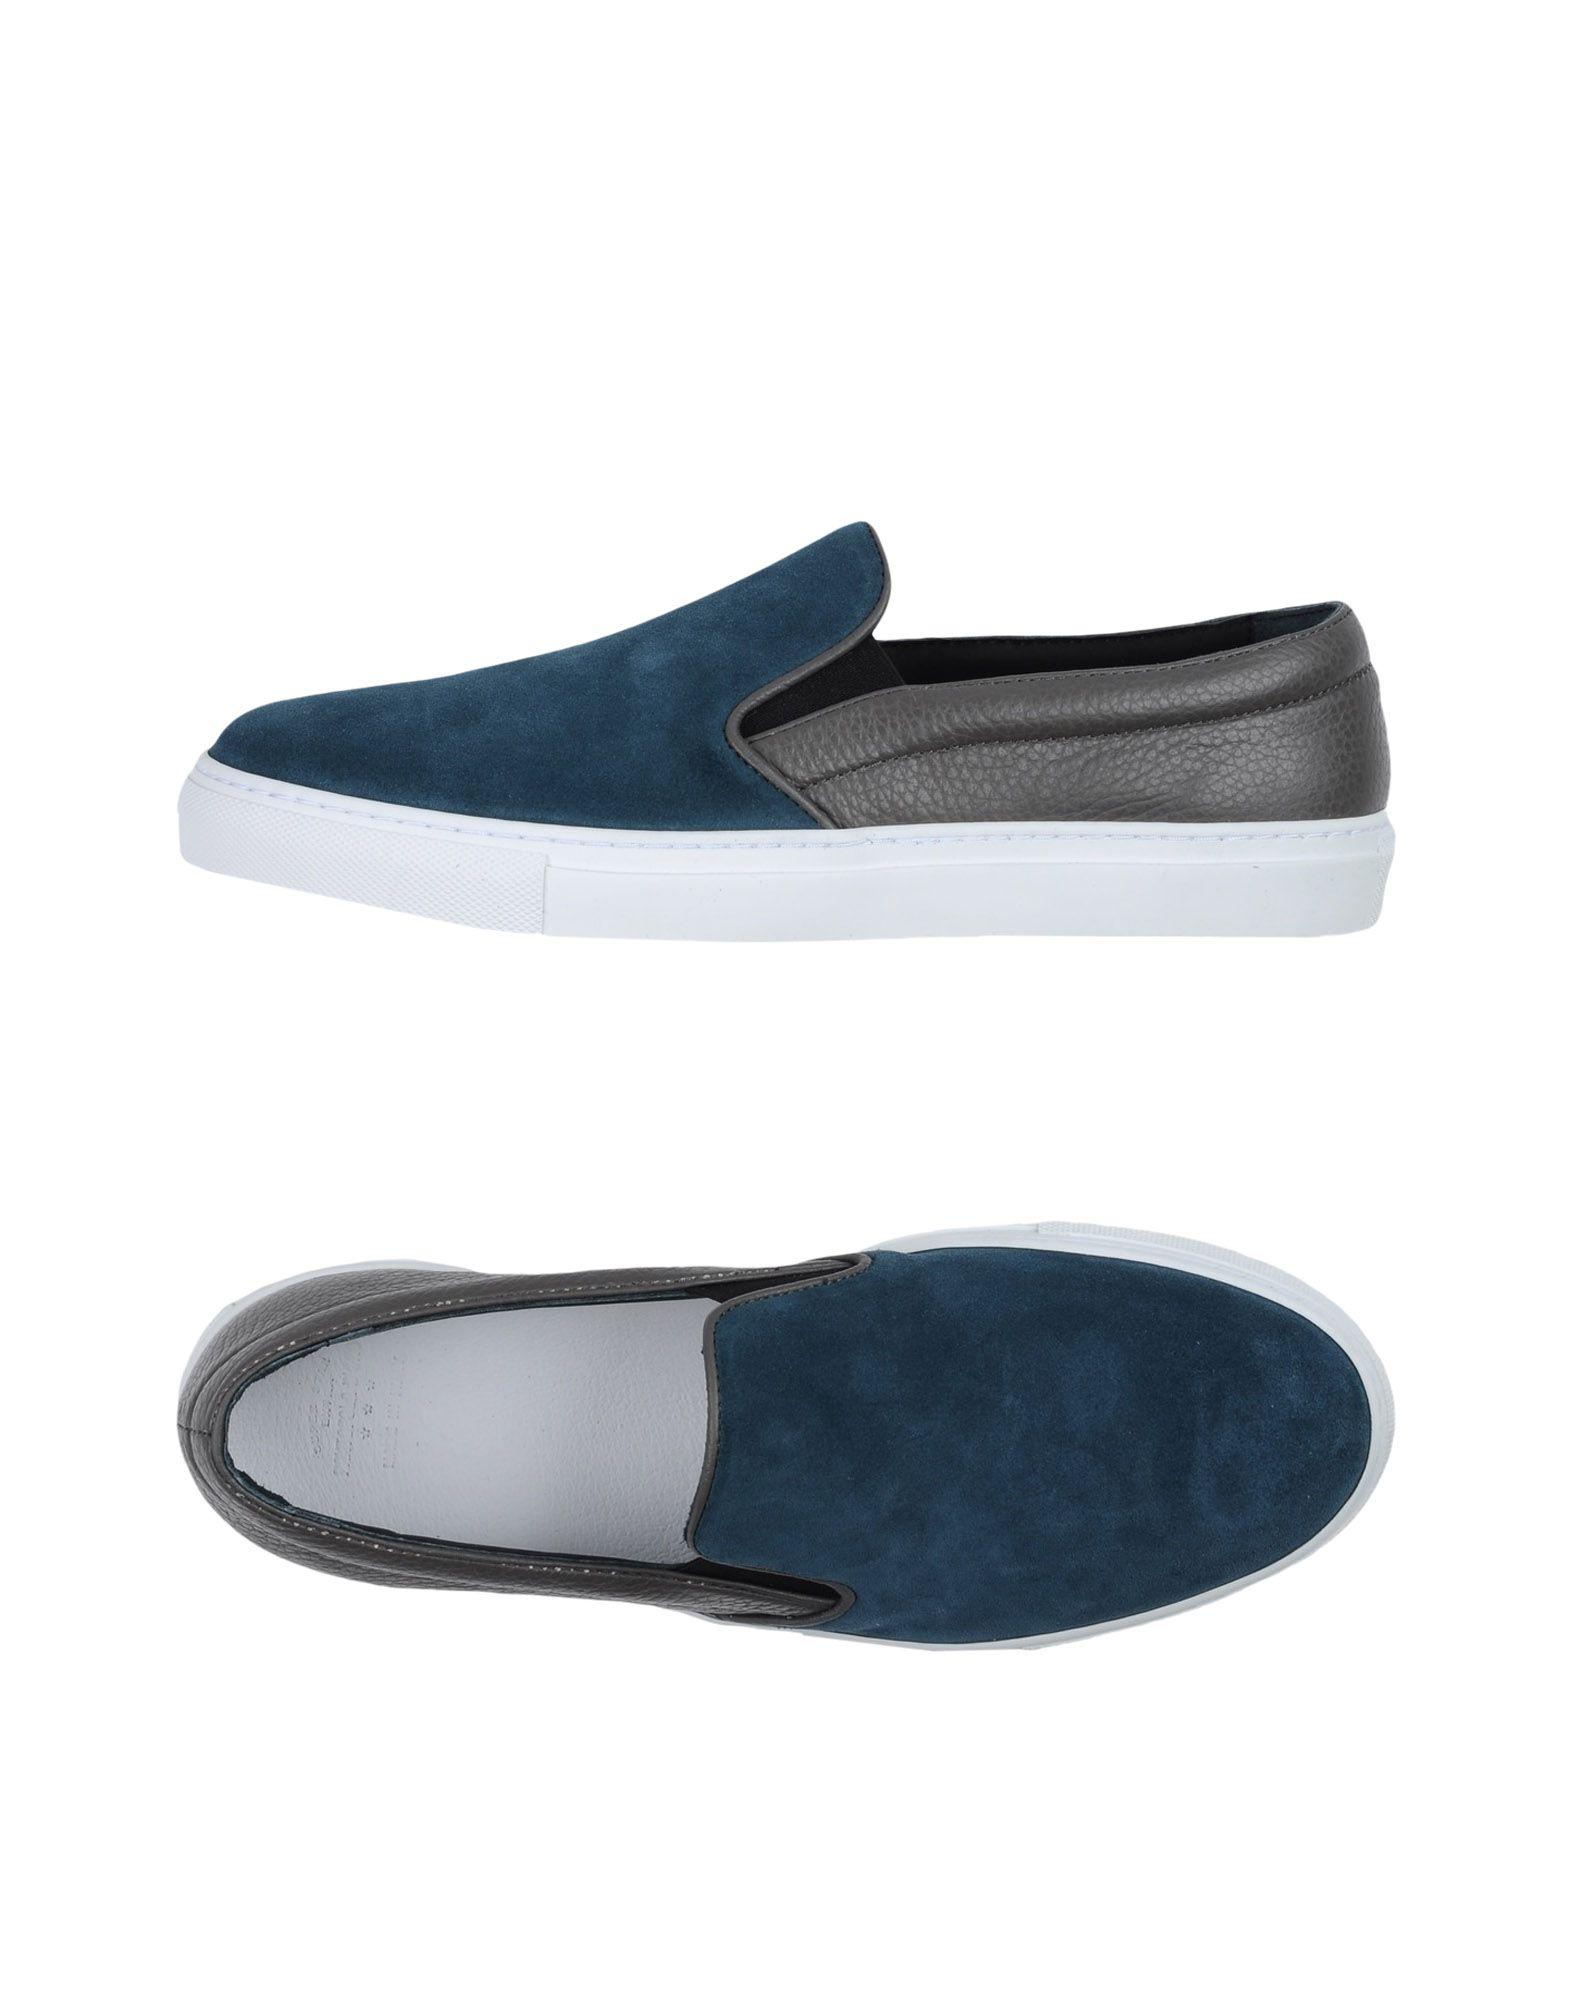 Scarpe Pantofola da Ginnastica Pantofola Scarpe D'oro Uomo - 11339431JF a2f244